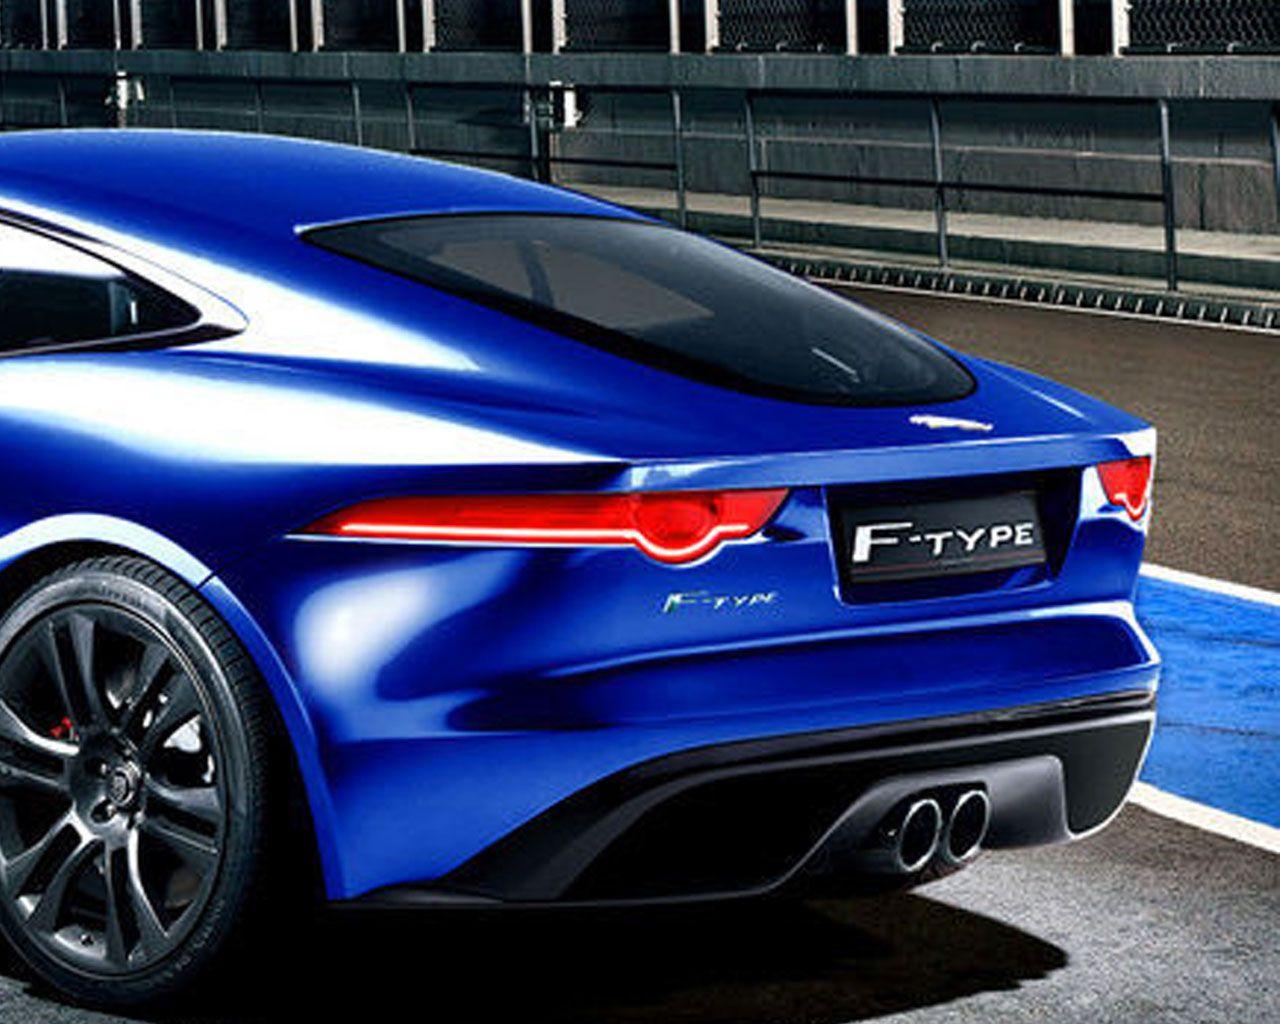 2014 Jaguar Ftype Coupe 2014 Jaguar FType Coupe Blue